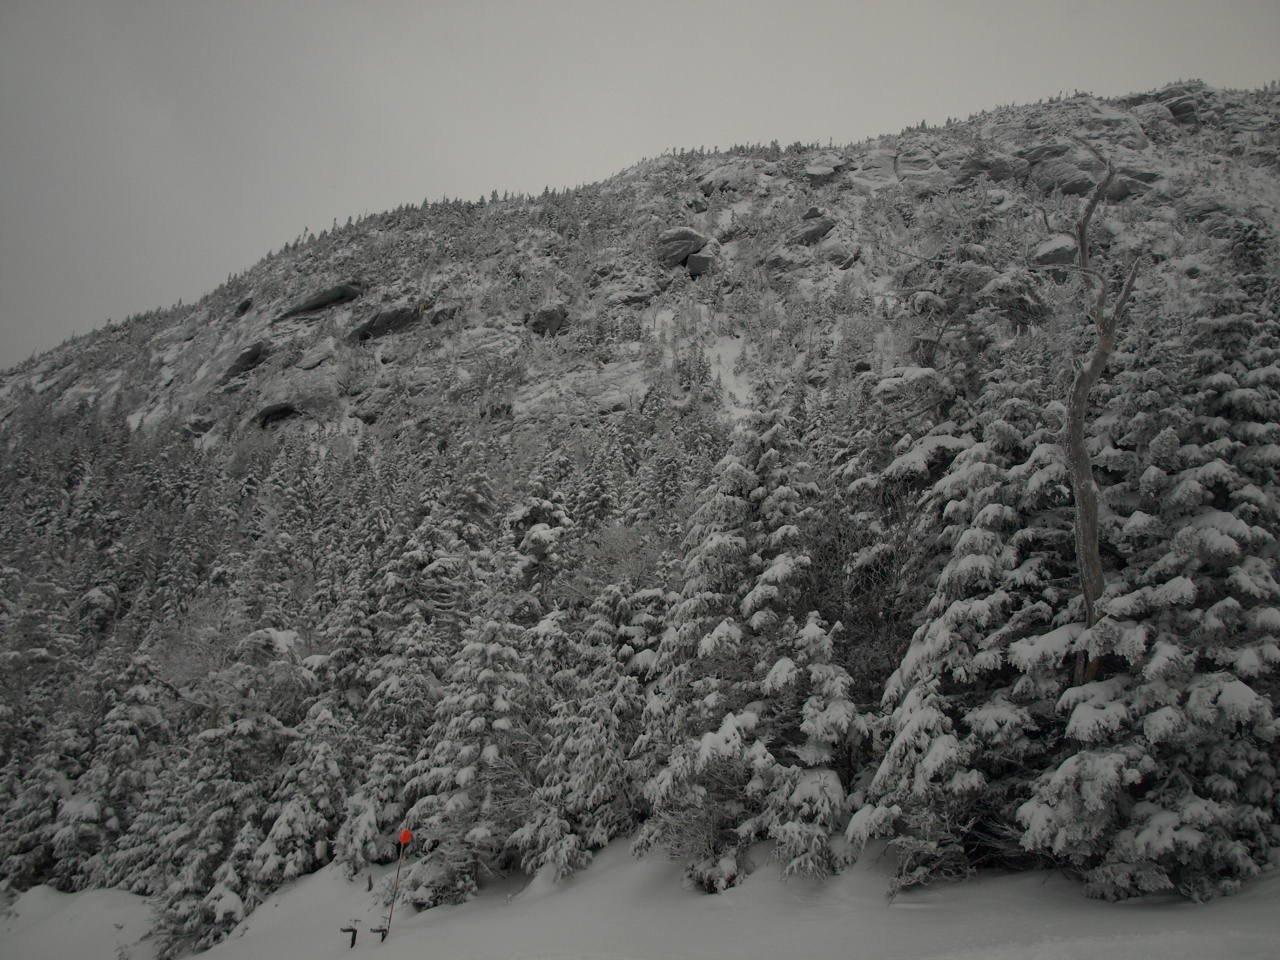 Stowe Winter '08